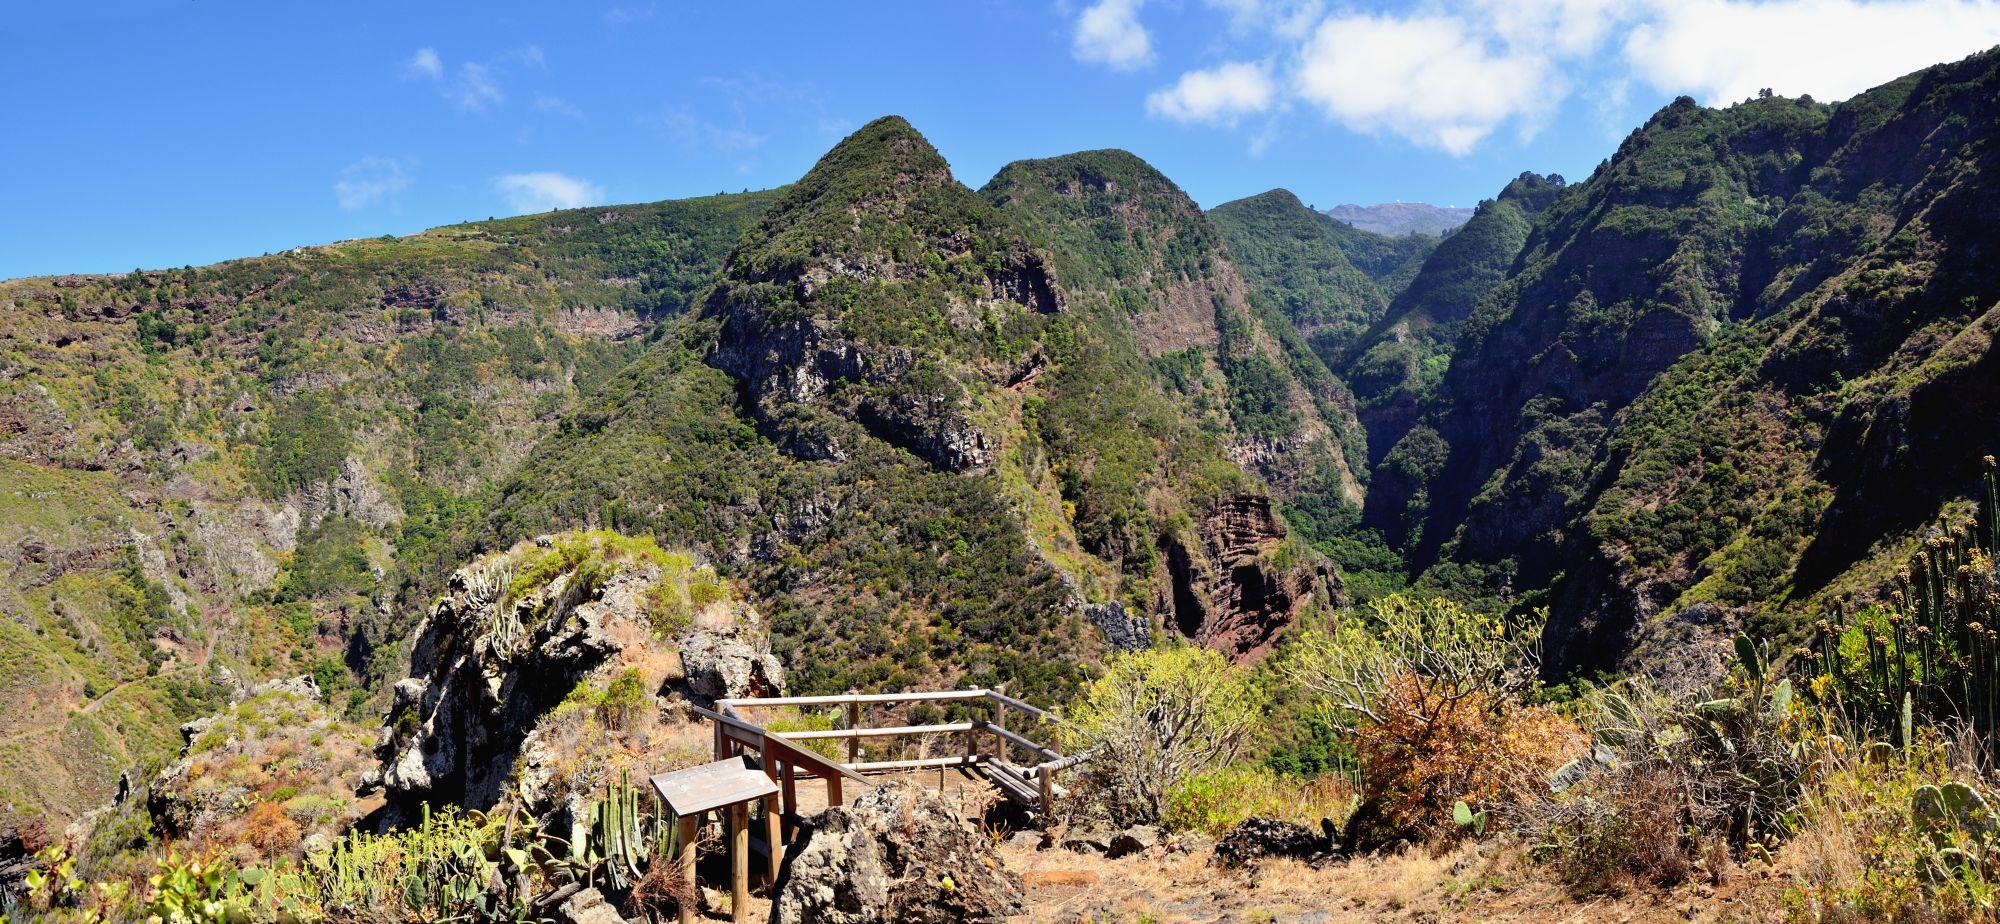 Norden von La Palma